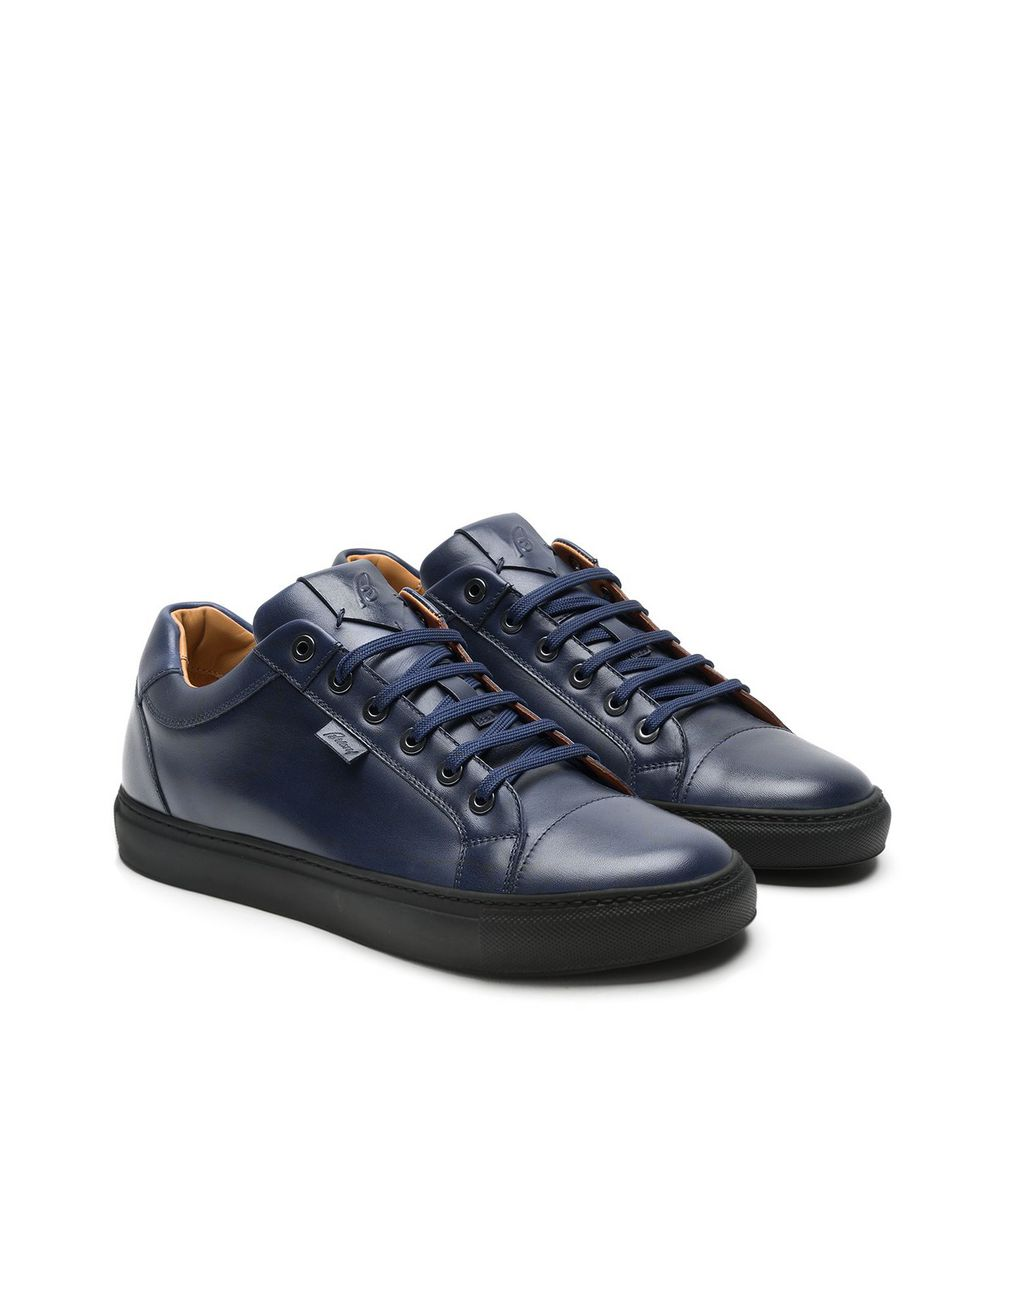 BRIONI Navy-Blue Calfskin Sneaker Sneakers [*** pickupInStoreShippingNotGuaranteed_info ***] d